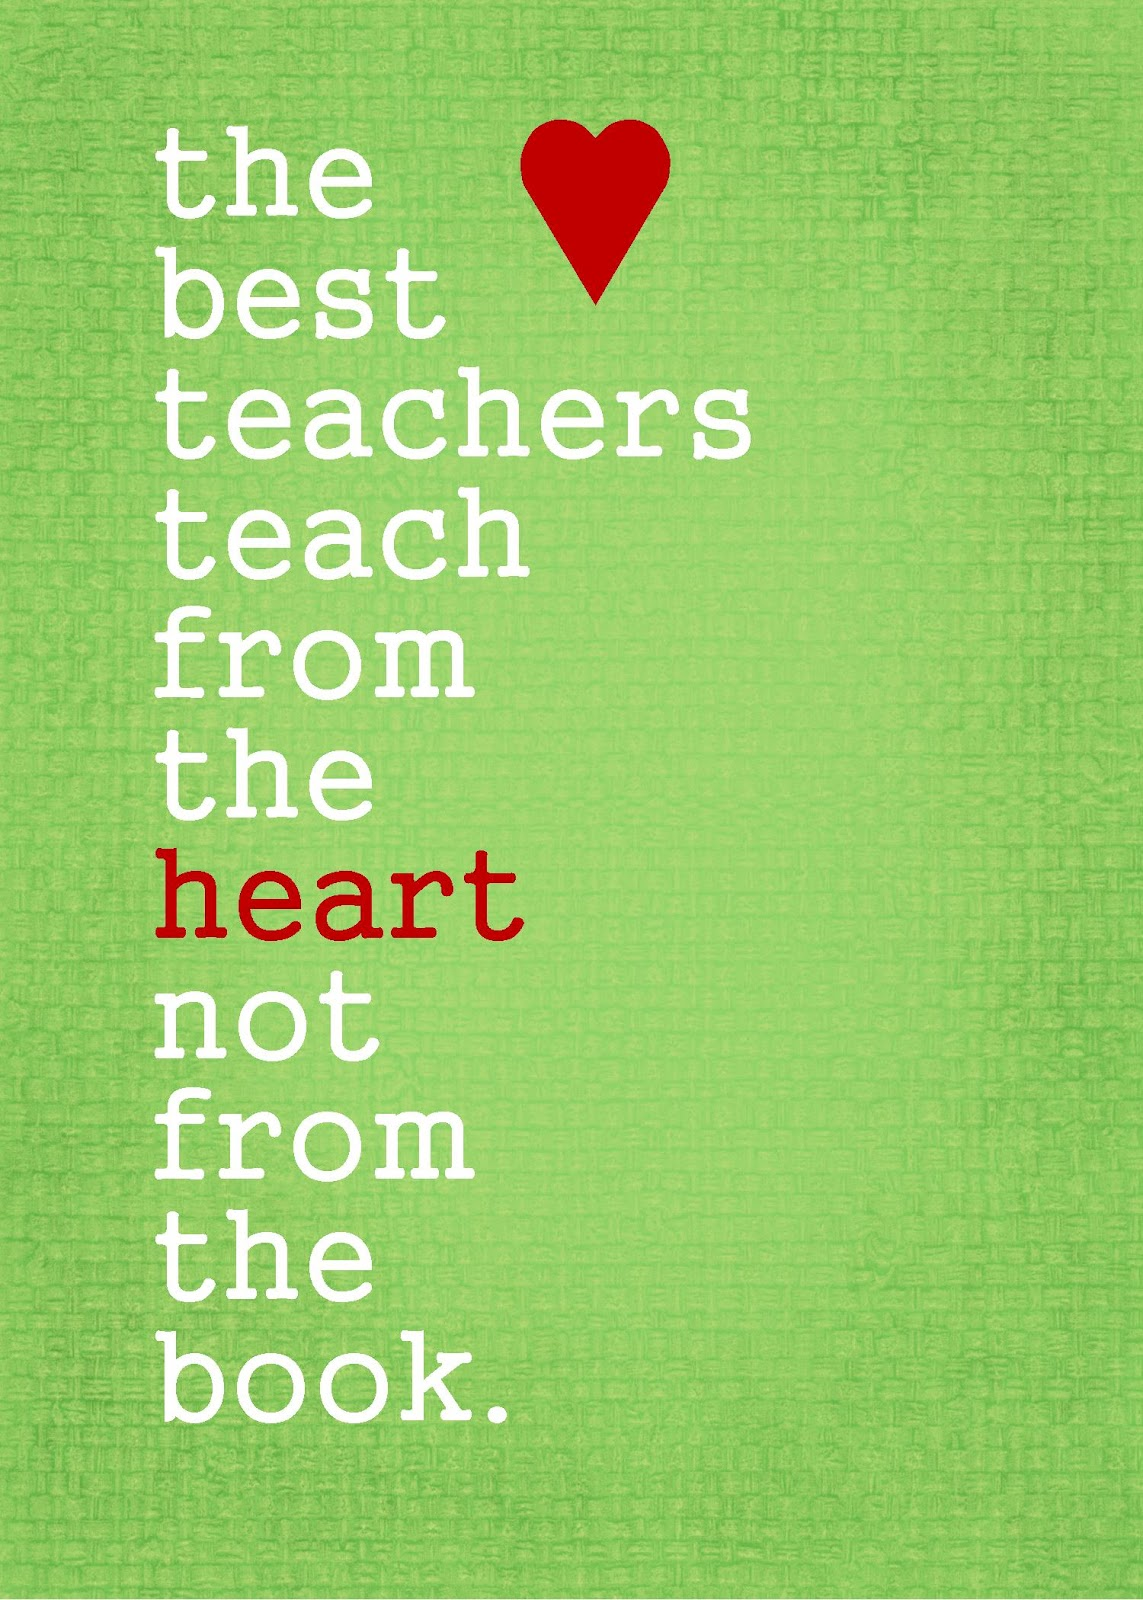 Remembering Why We Become Teachers | Three Teachers Talk